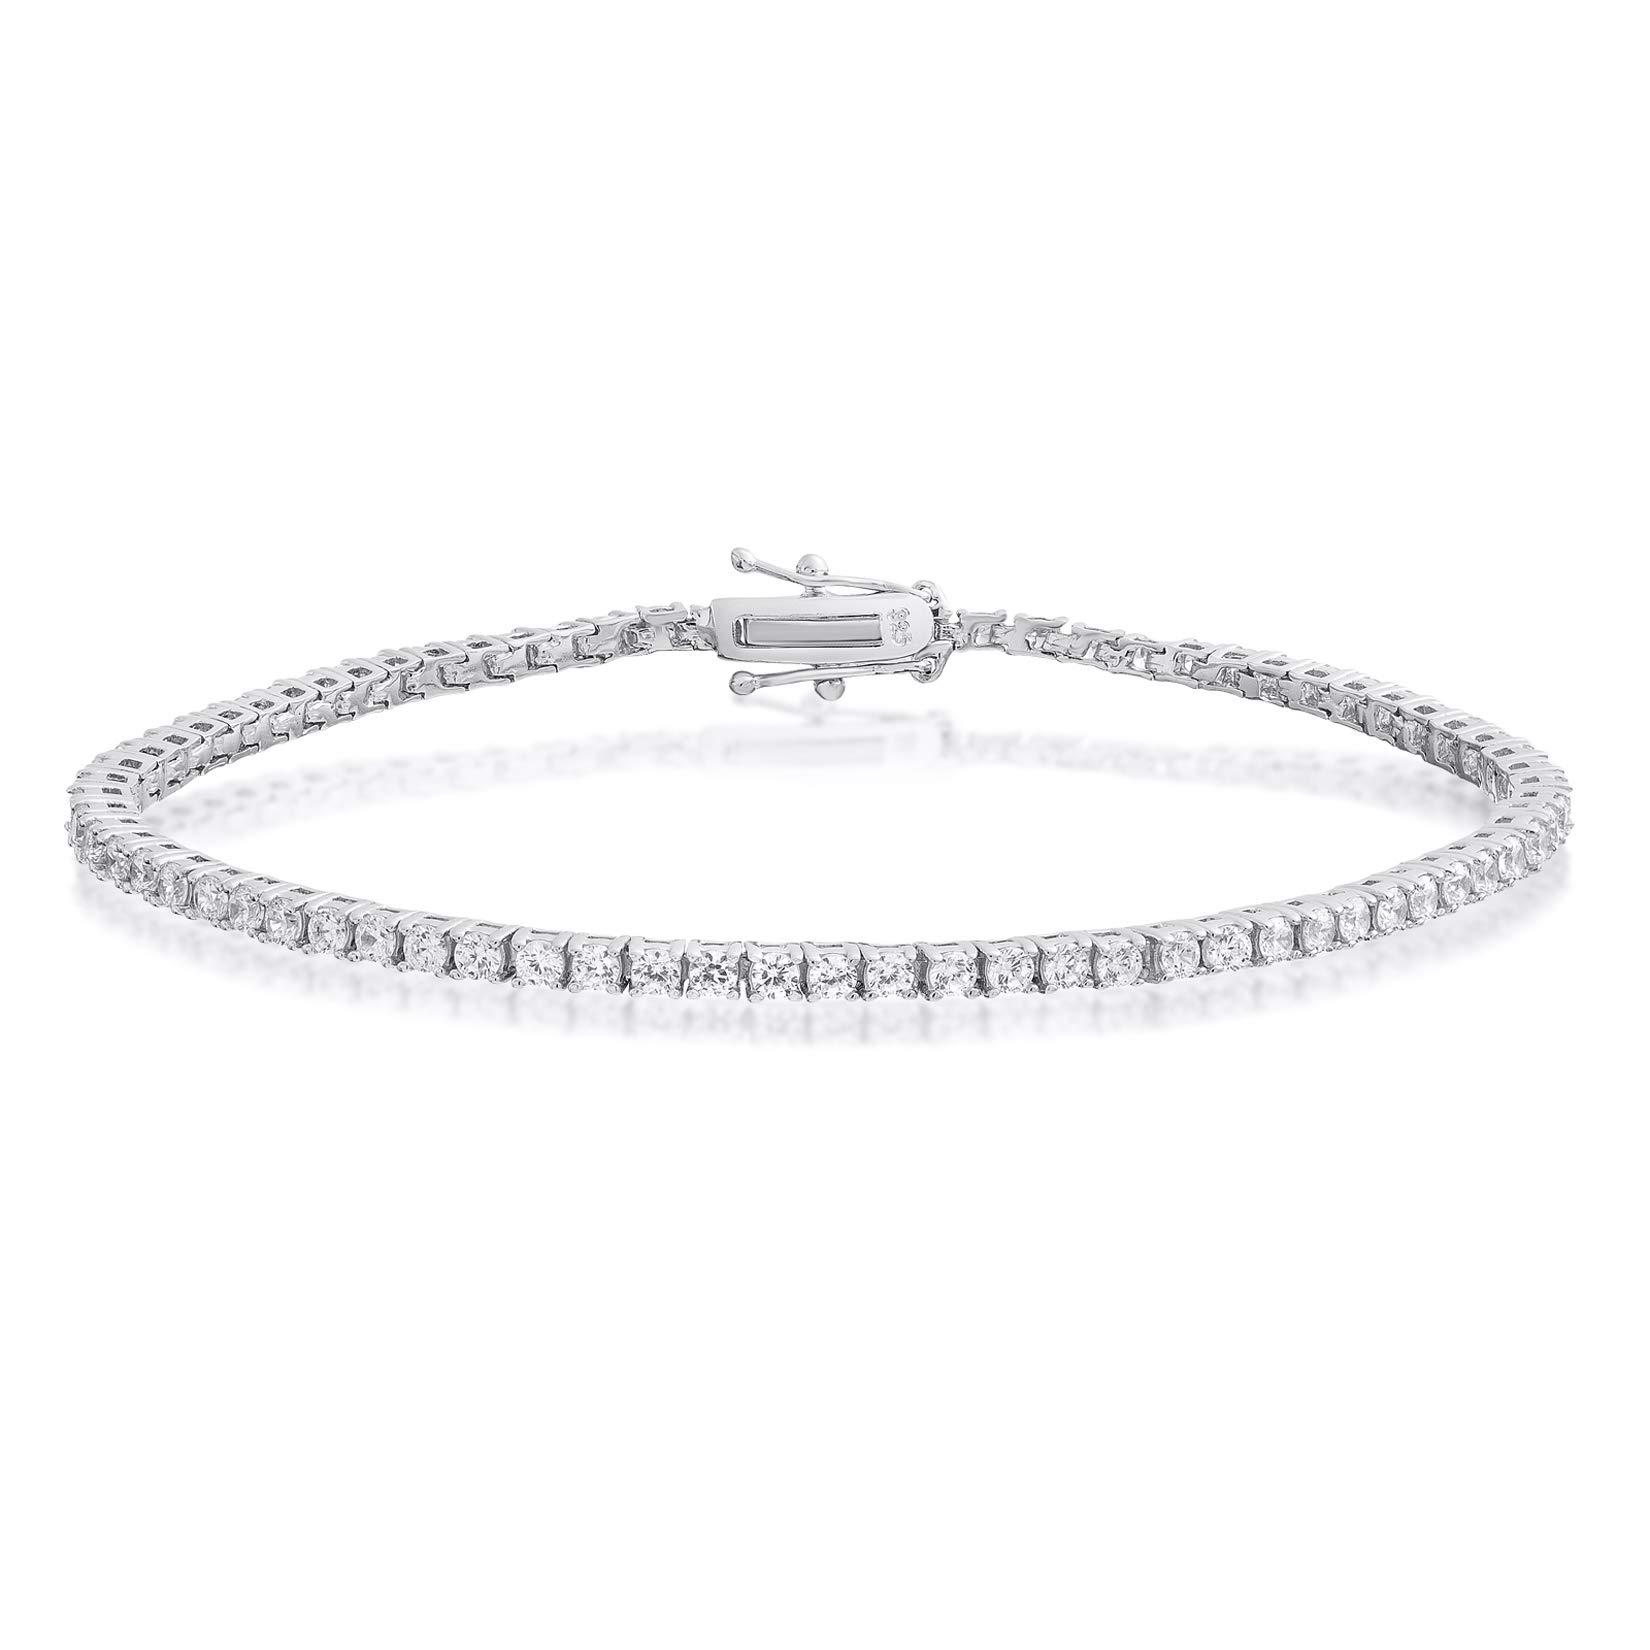 Sterling Silver Round Cut 2mm Cubic Zirconia Tennis Bracelet 6.5 inch